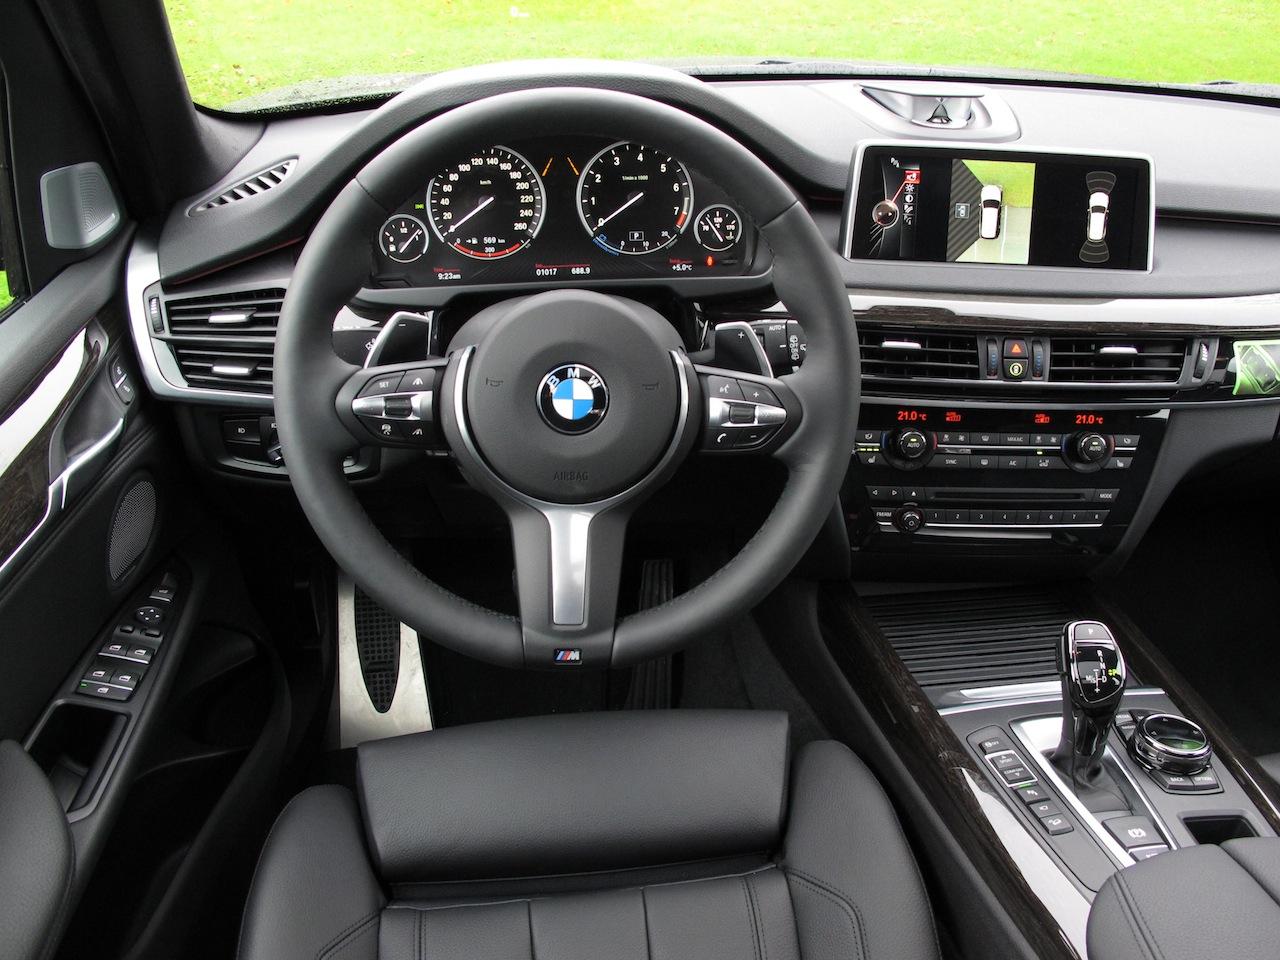 2014 Range Rover Sport V6 Hse And 2014 Bmw X5 Xdrive50i